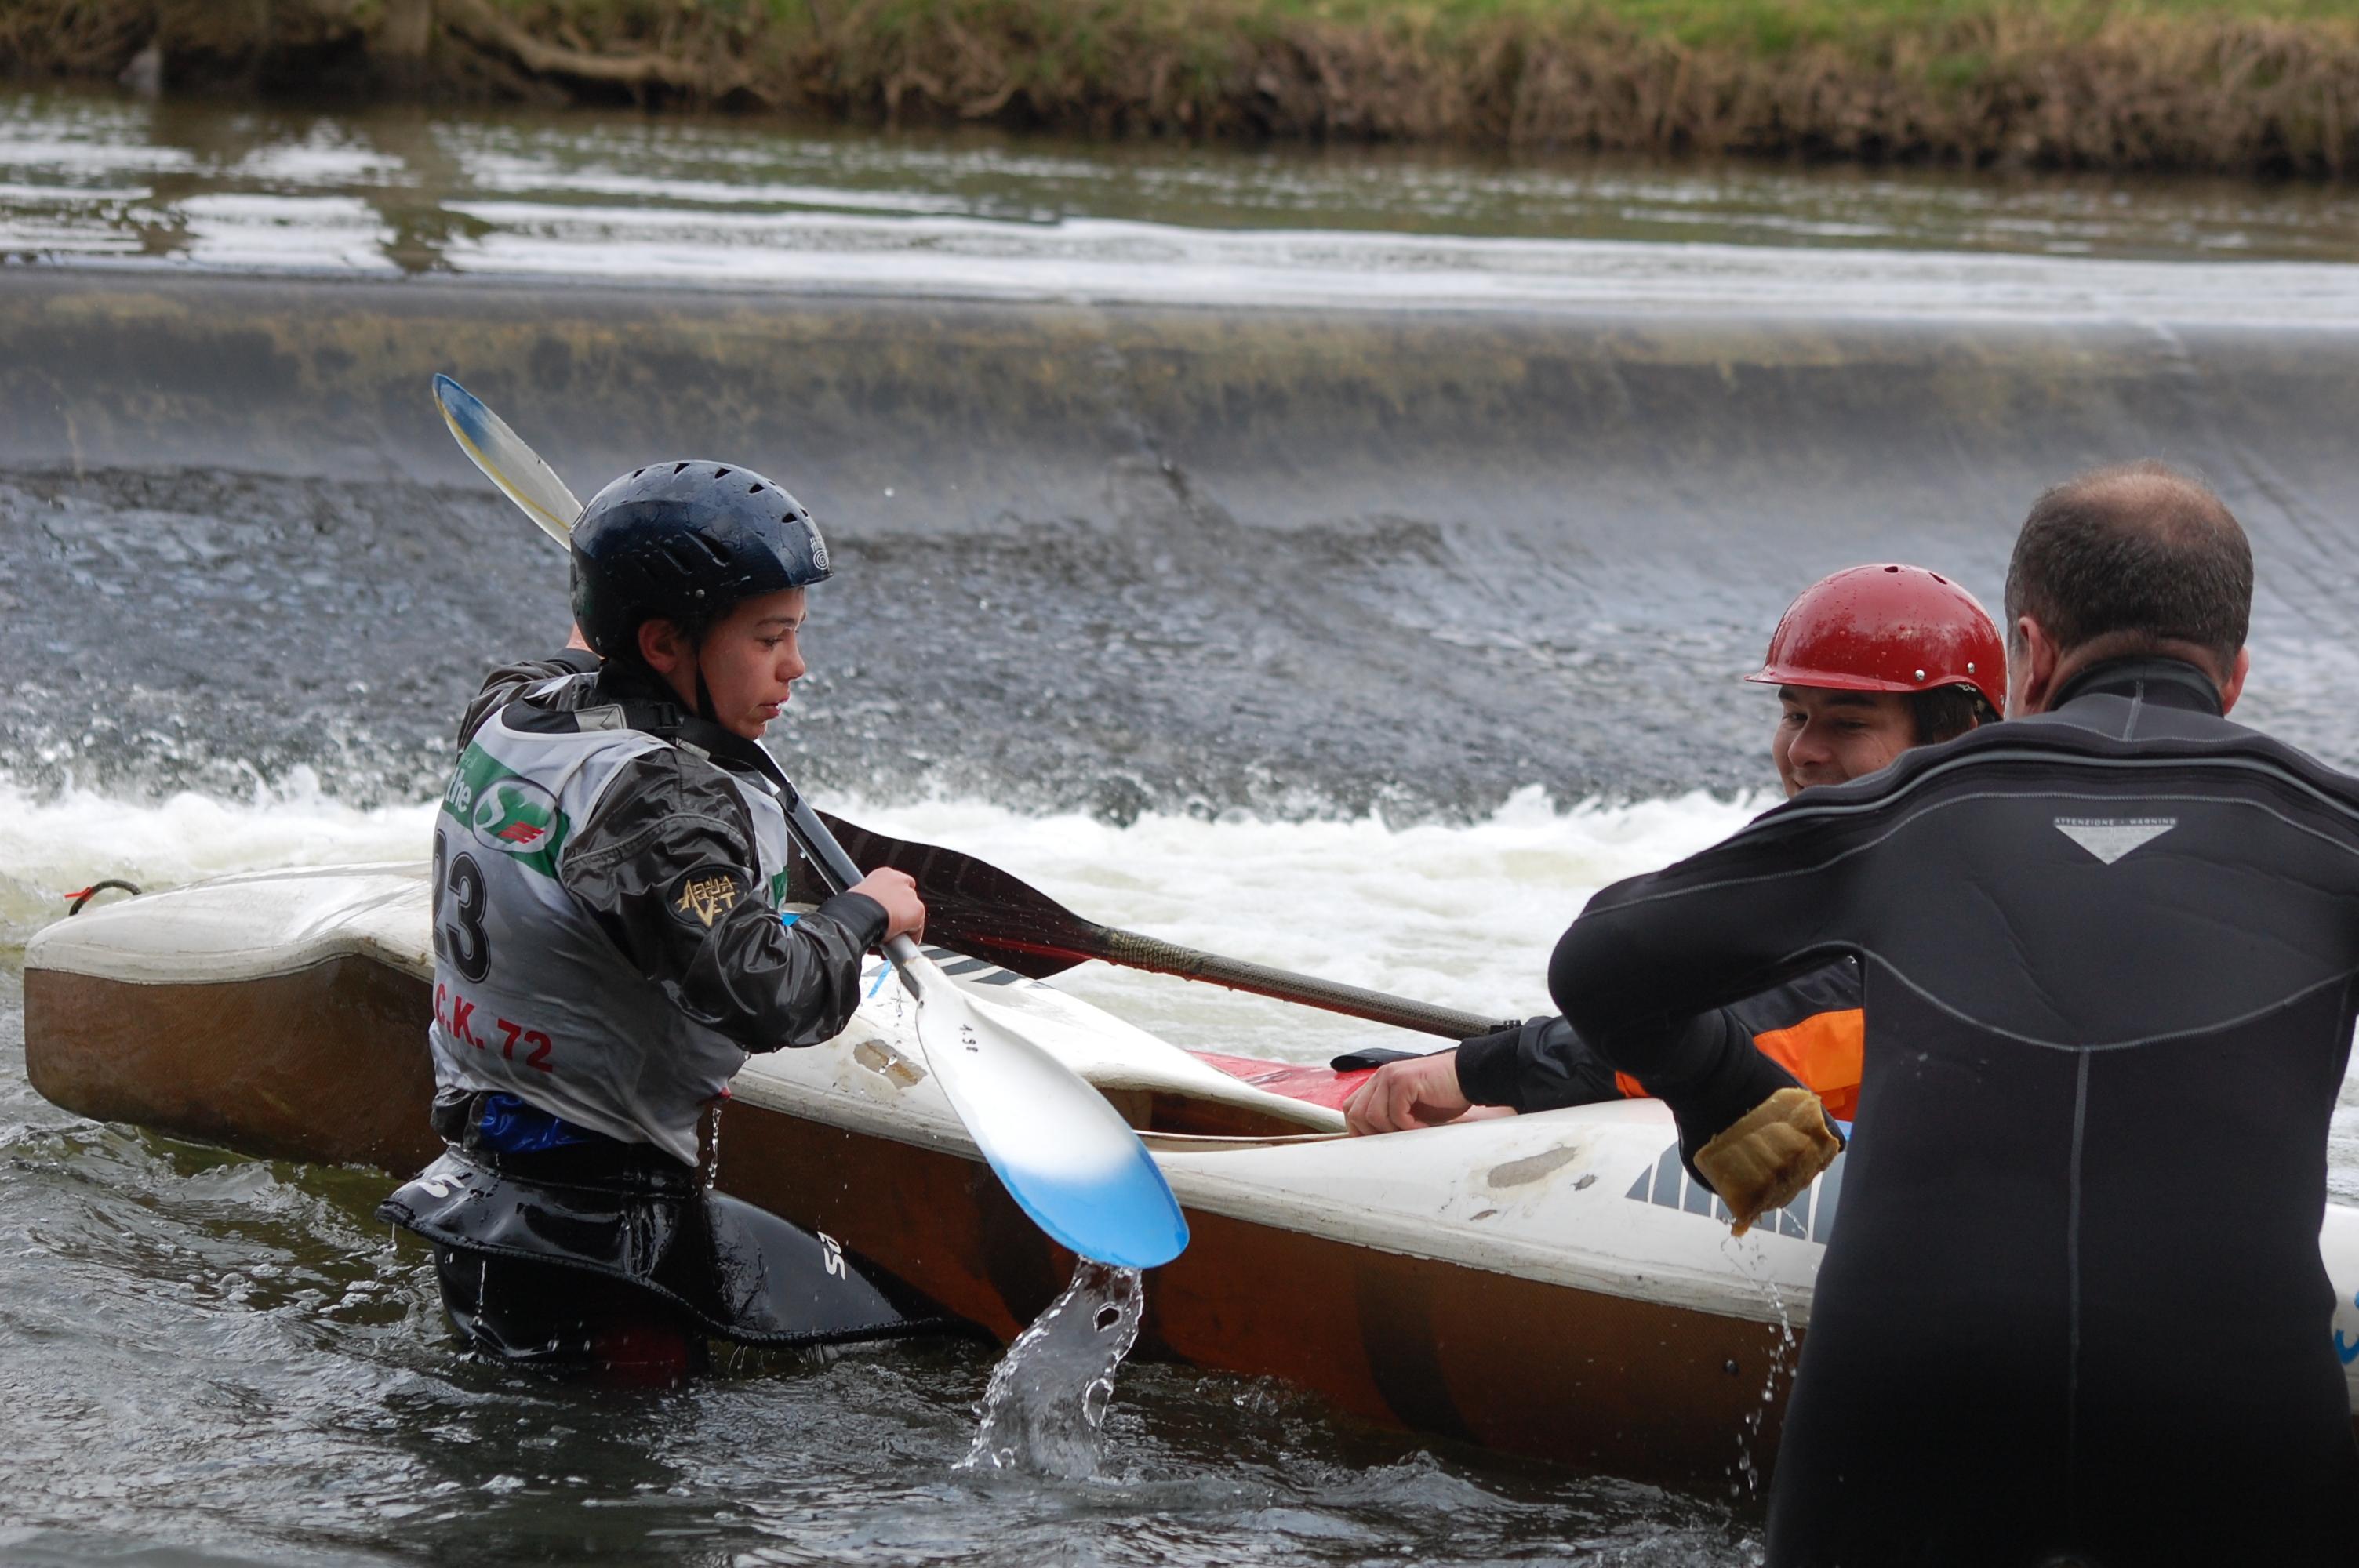 Canoe Saint Leonard Des Bois u2013 Myqto com # Canoe St Leonard Des Bois